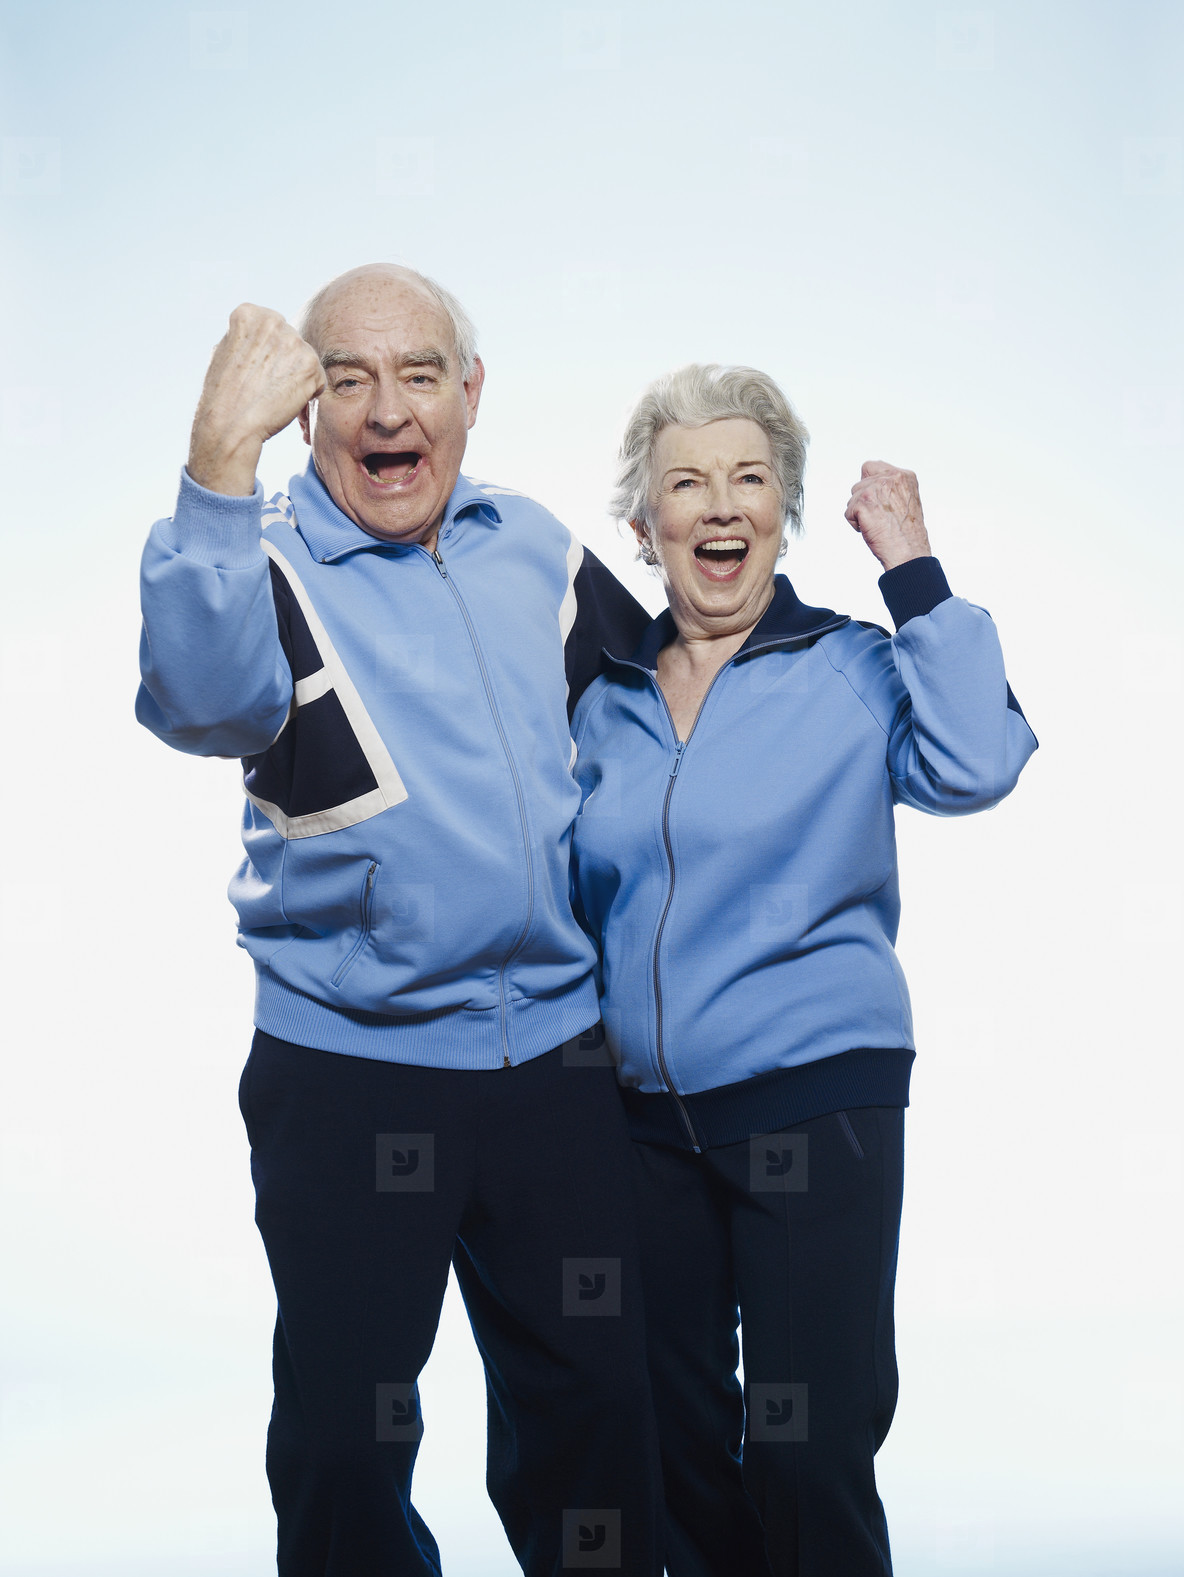 Life of a Senior Couple  75